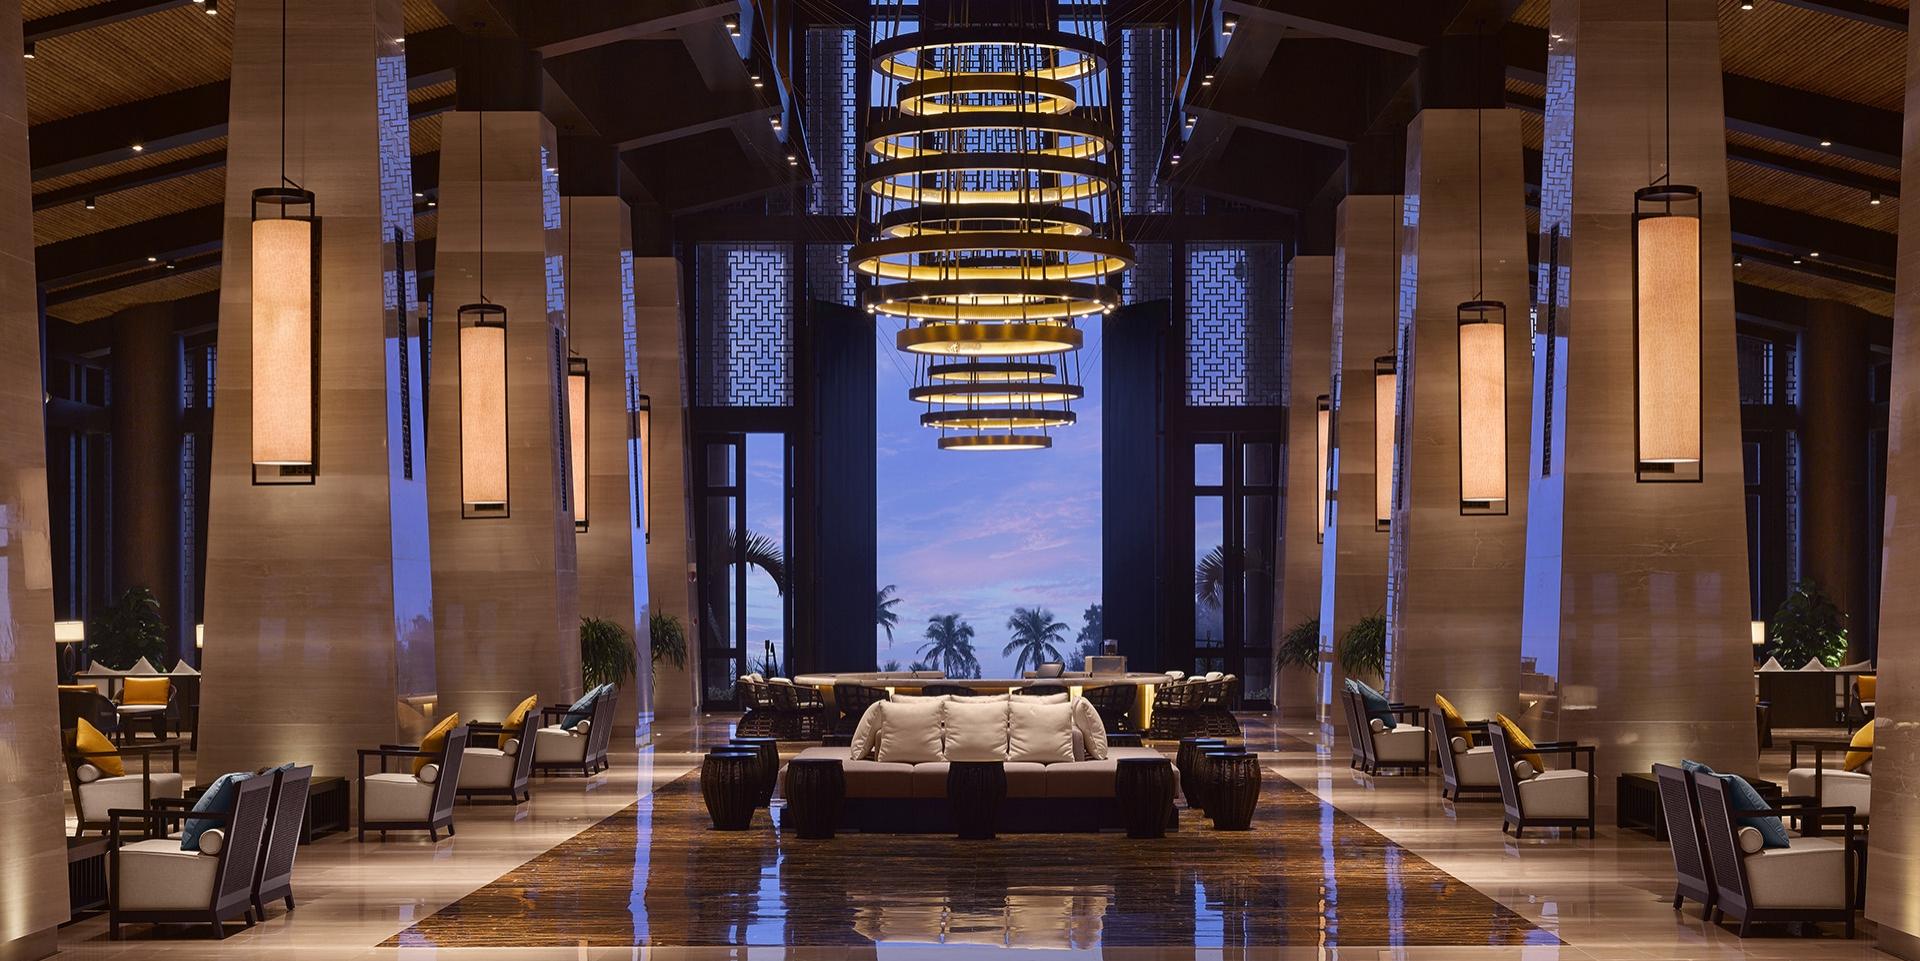 Hirsch Bedner Associates An Experience in Hospitality Interior Design 1